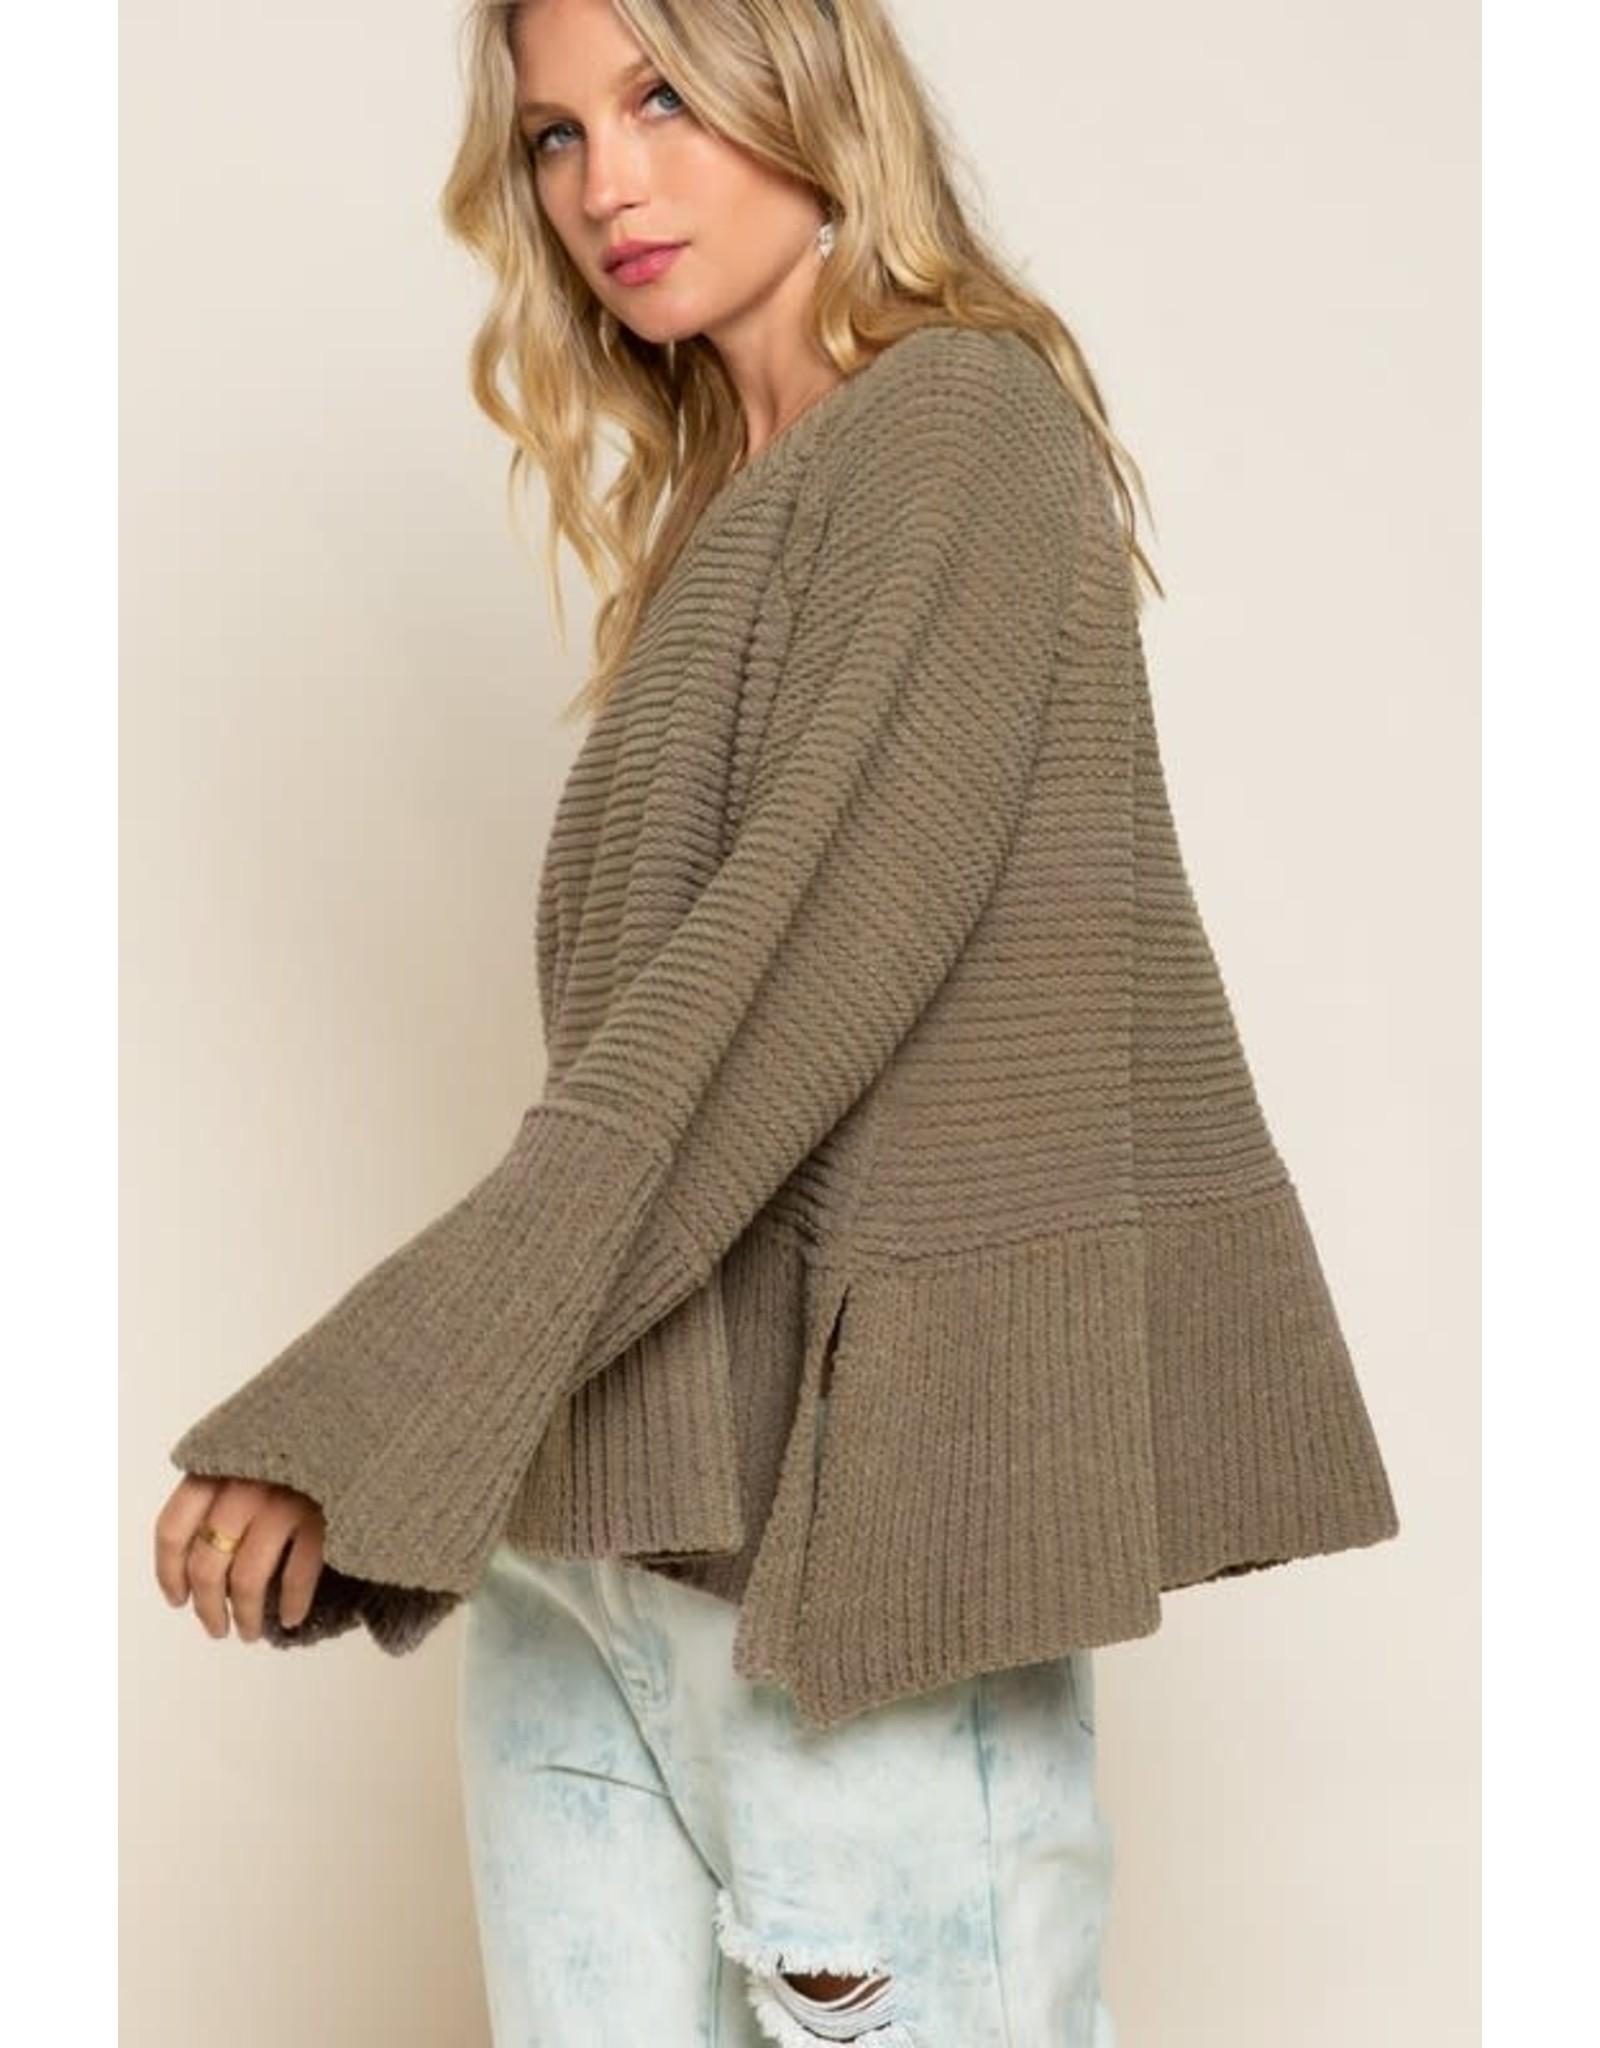 Mountain Cabin Nights Sweater